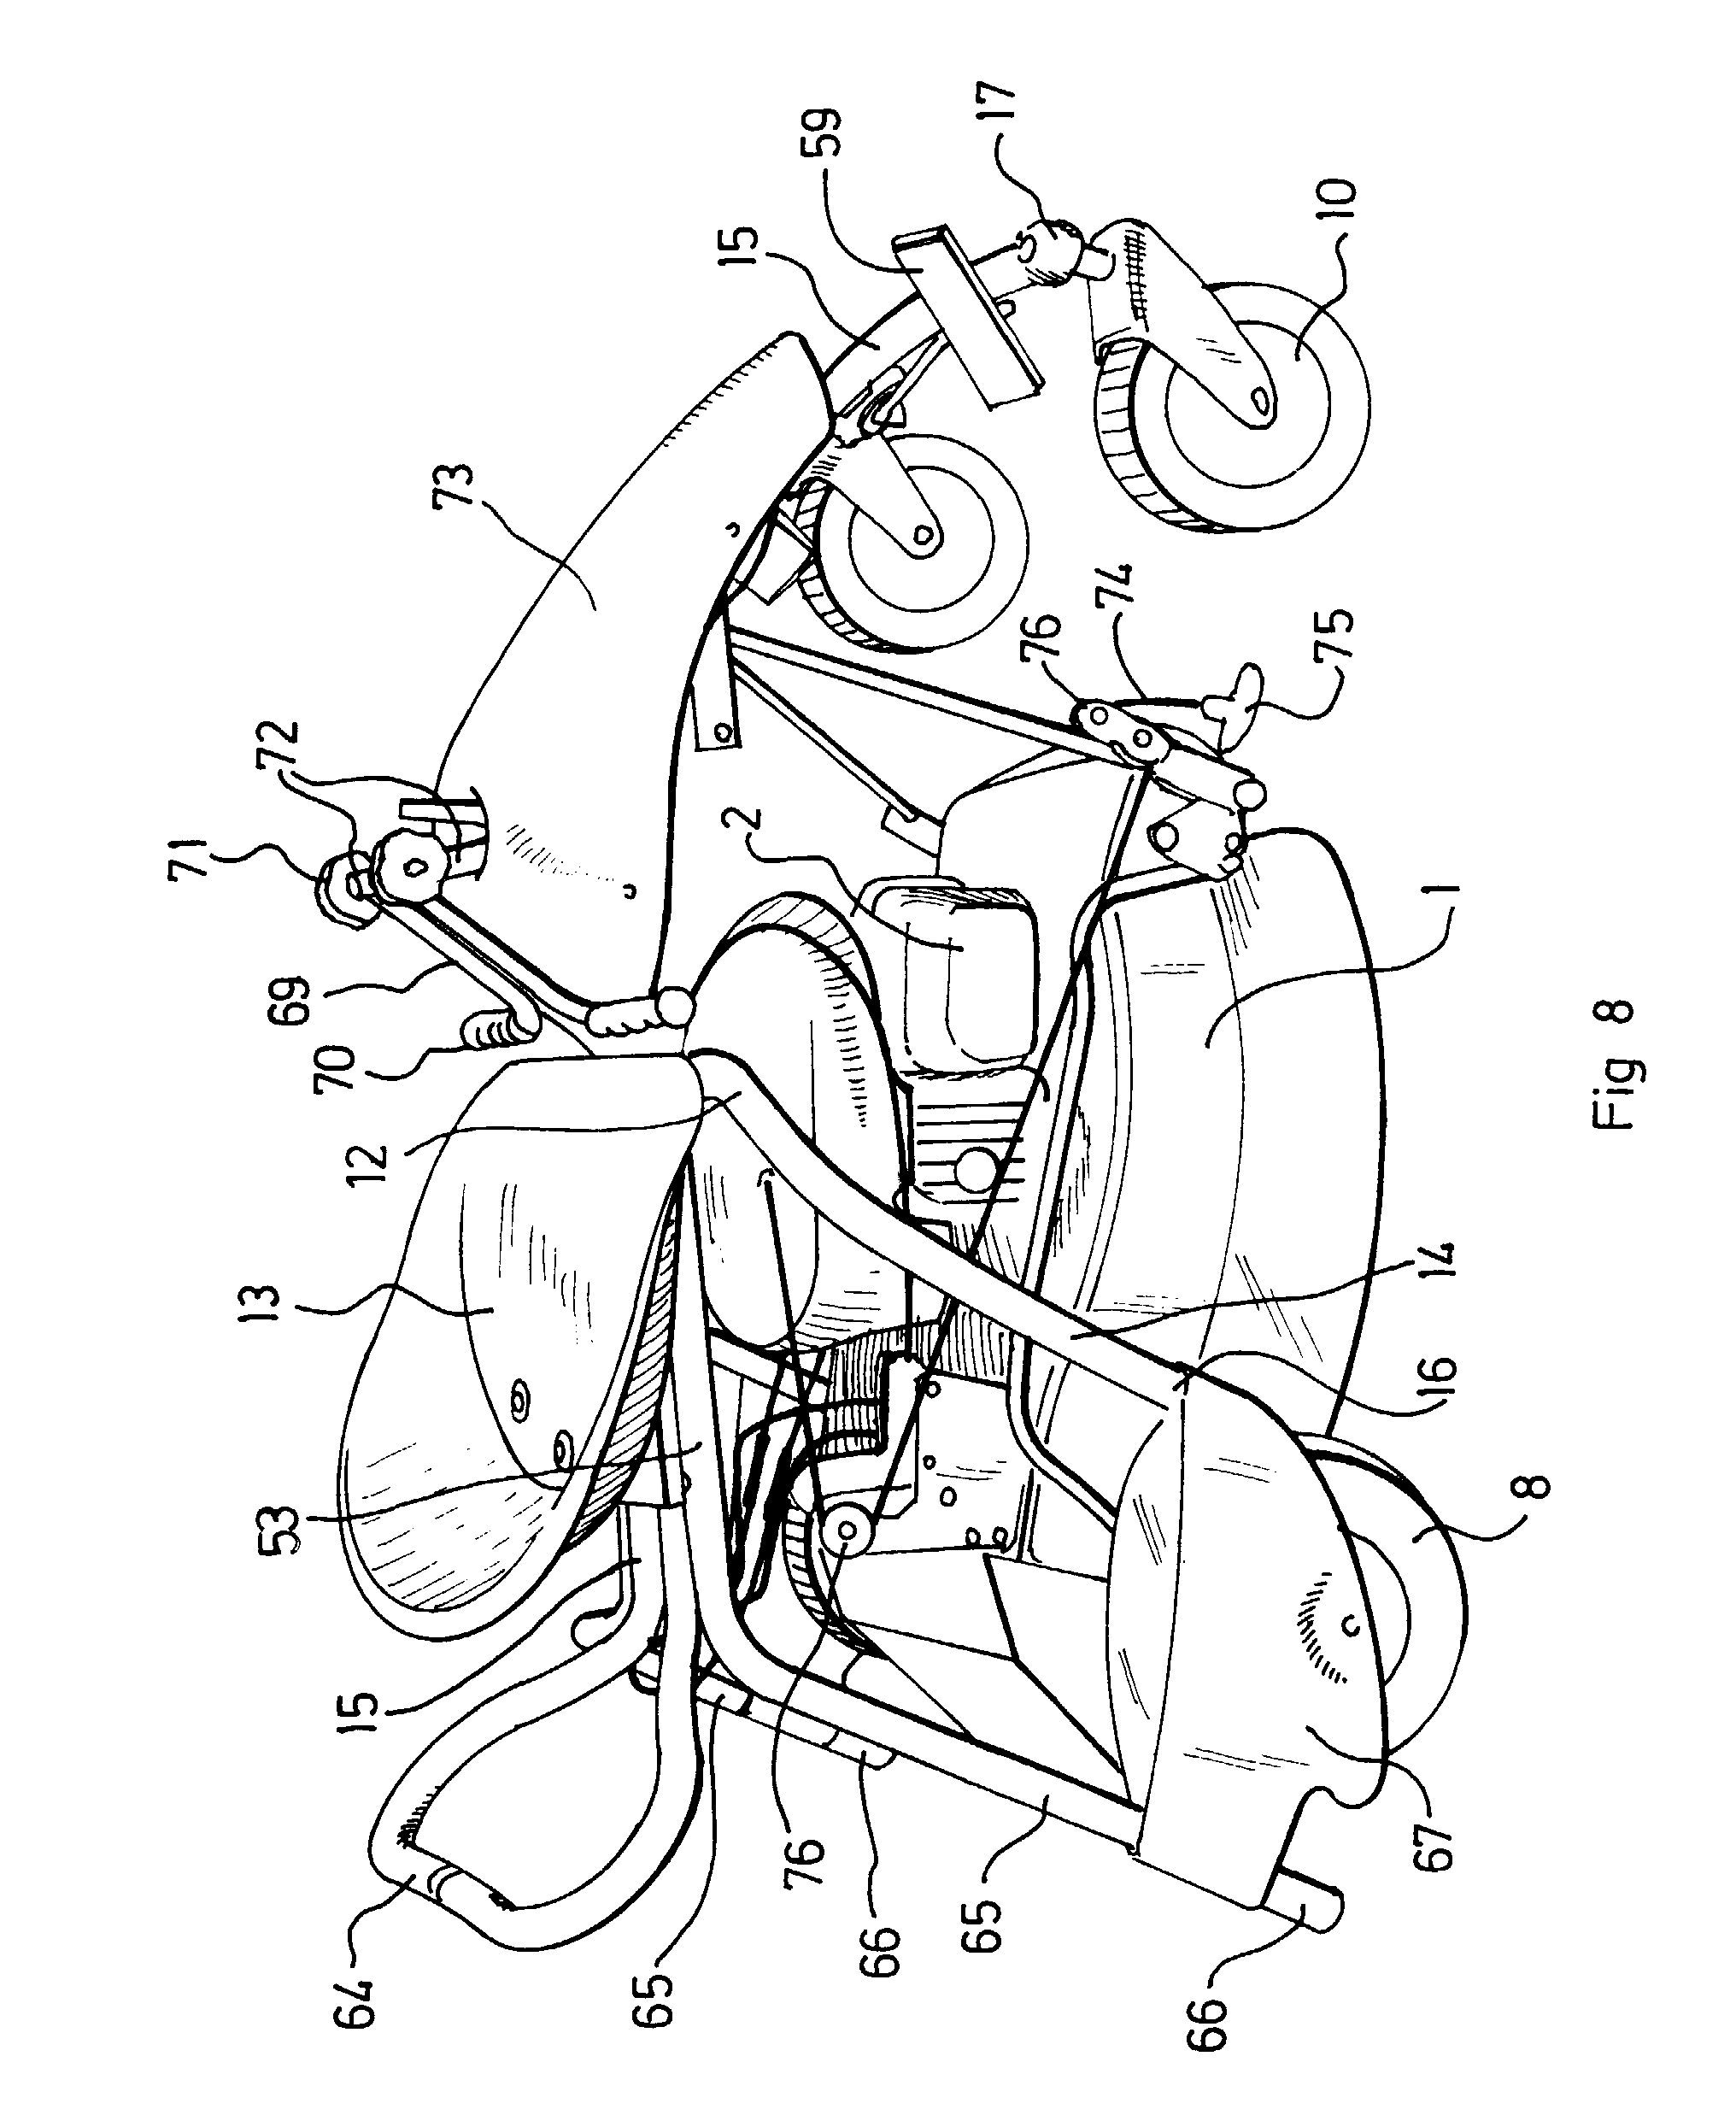 patent ep0981944a1